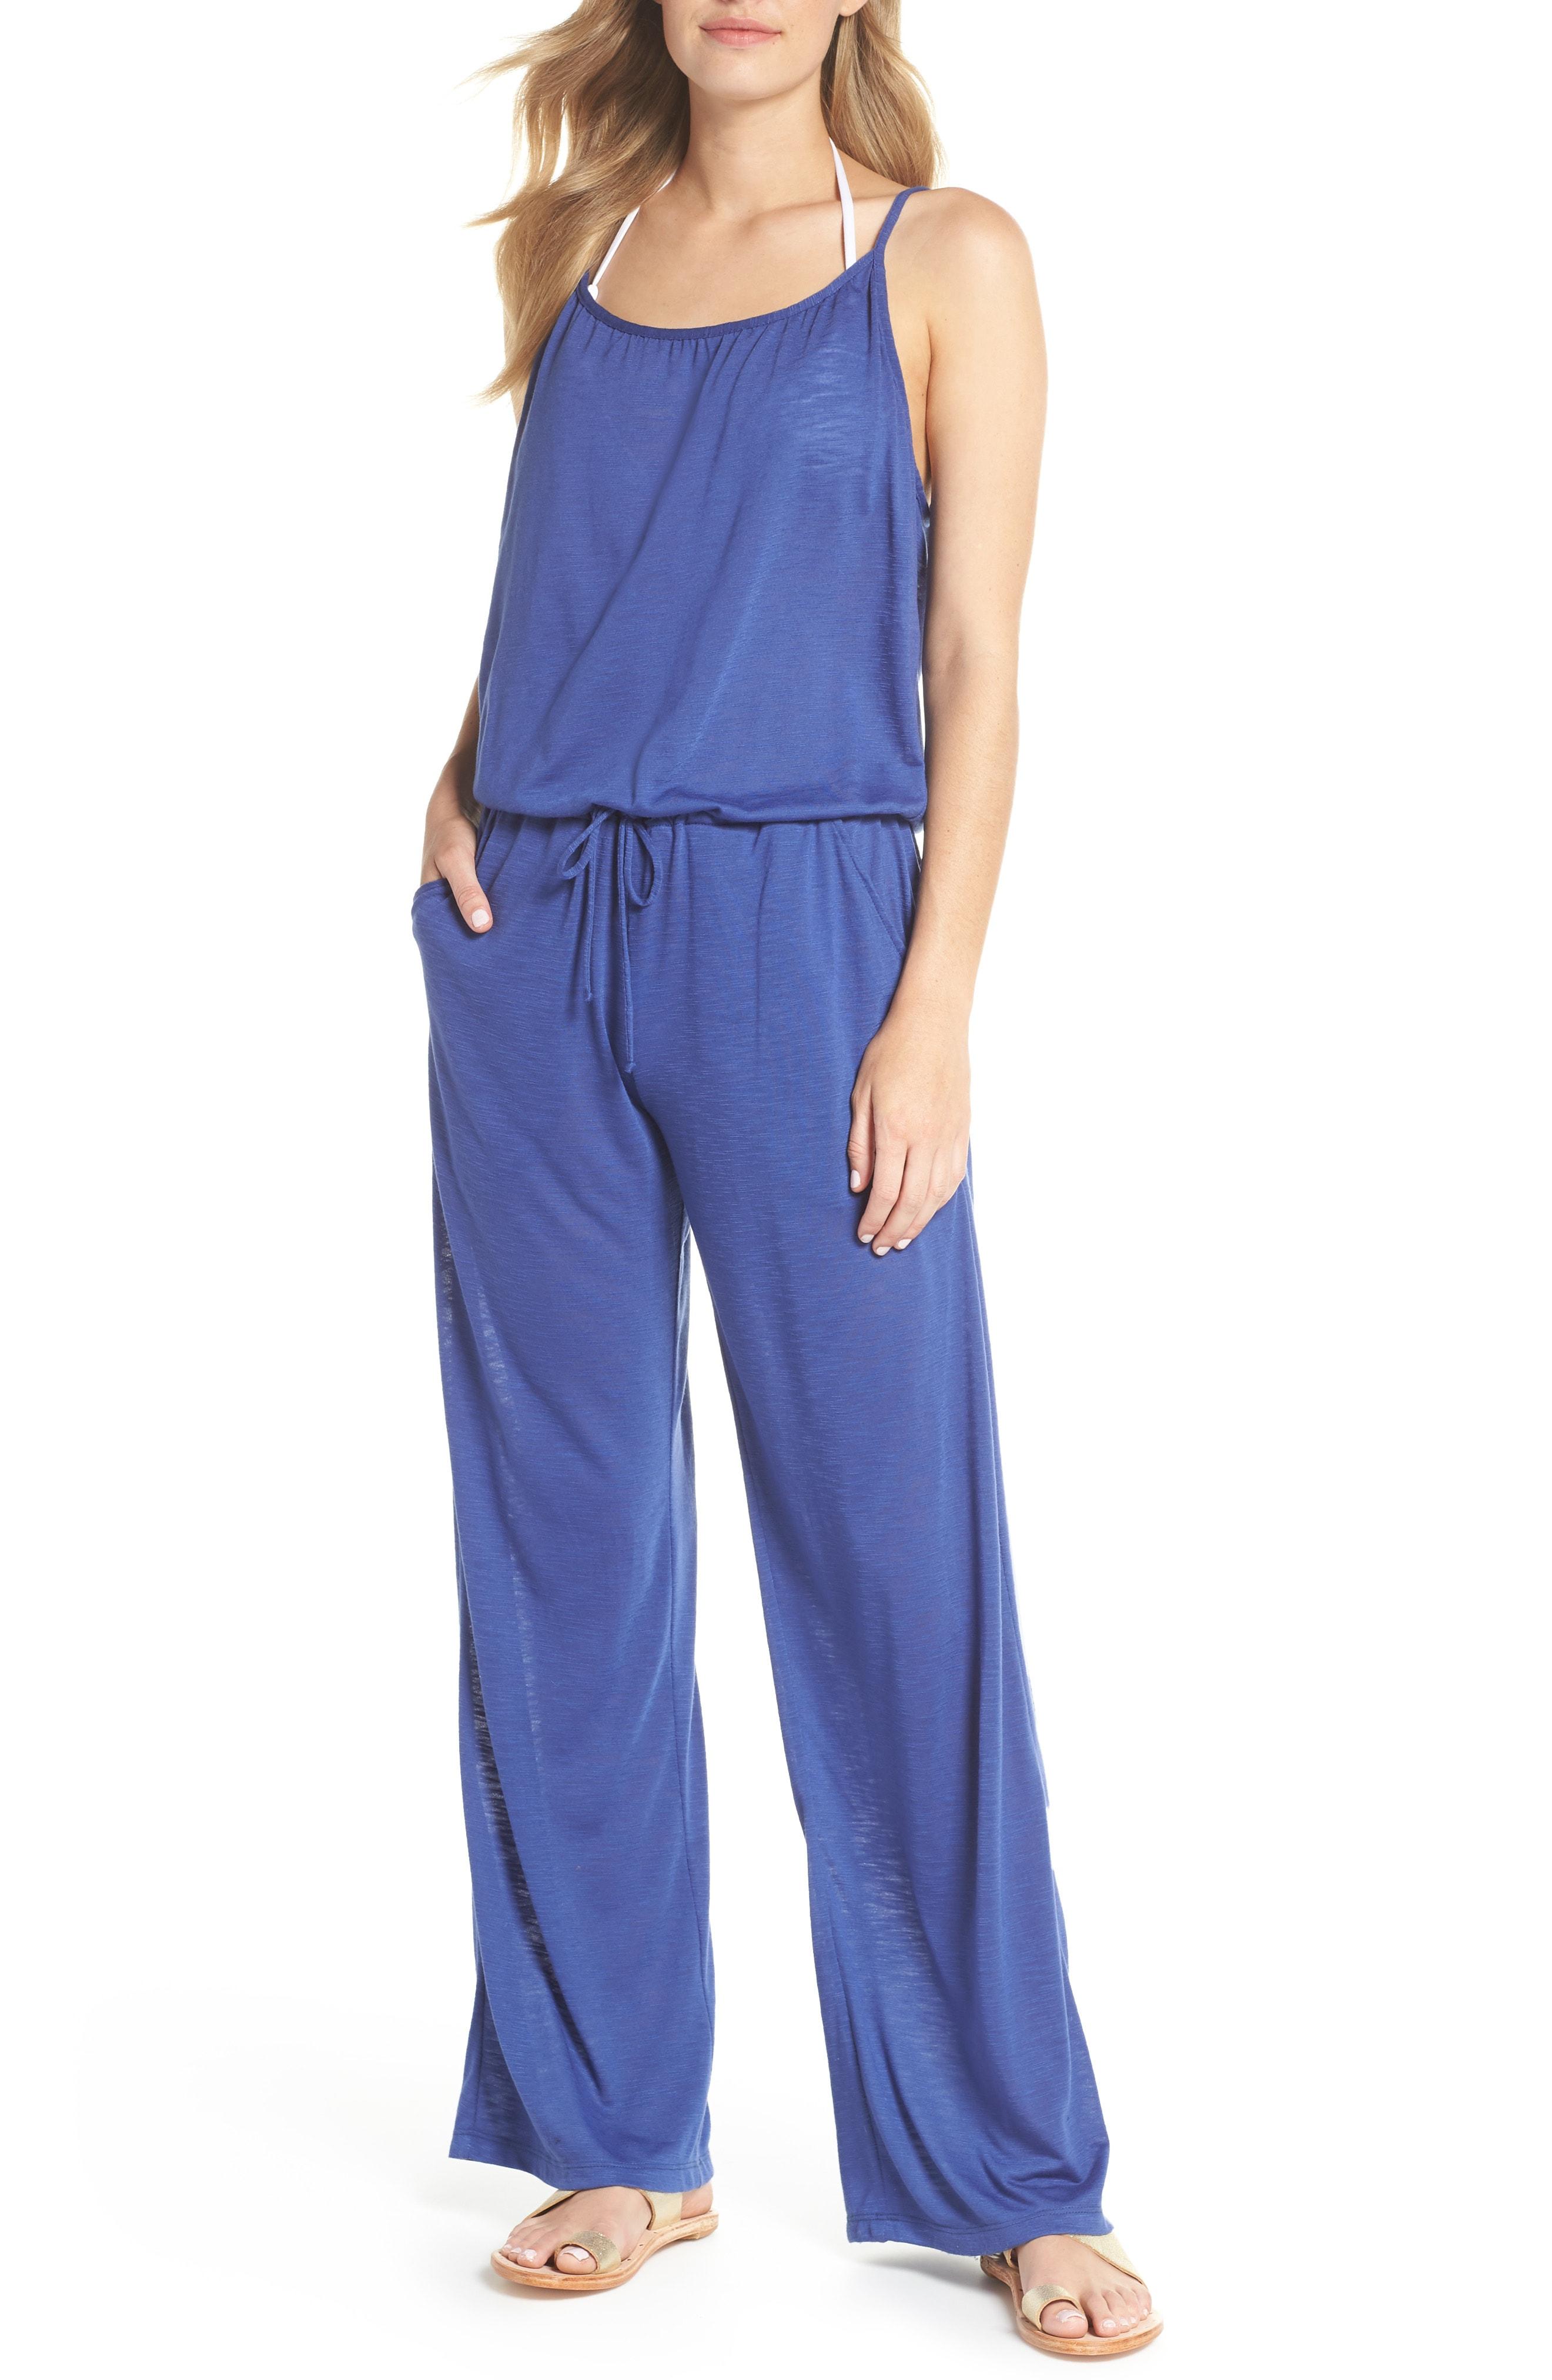 Becca Breezy Basics Jumpsuit